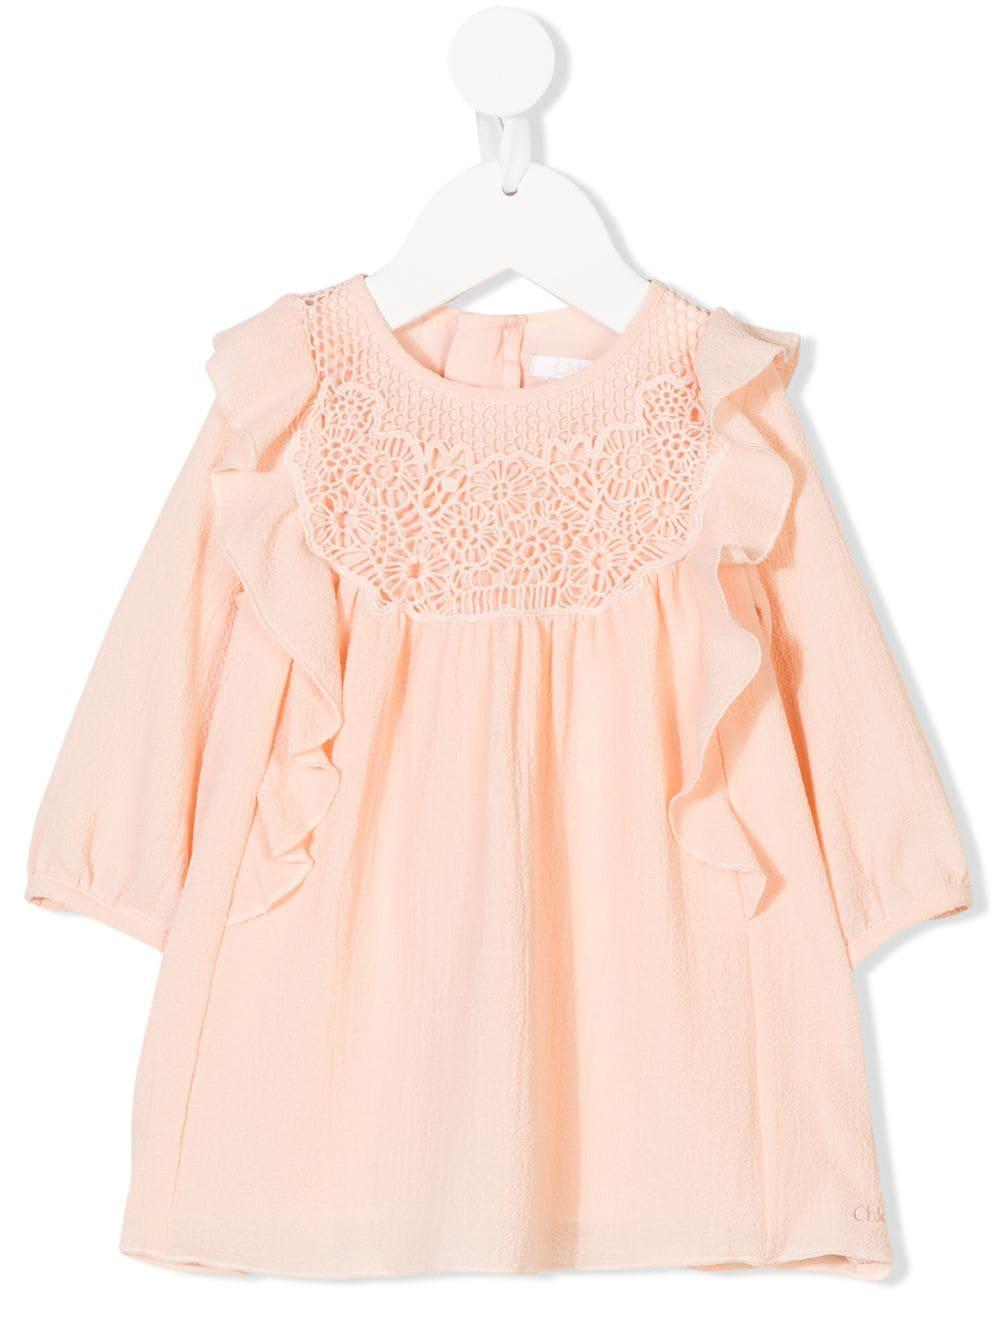 Chloé Kids | ruffled dress | Clouty